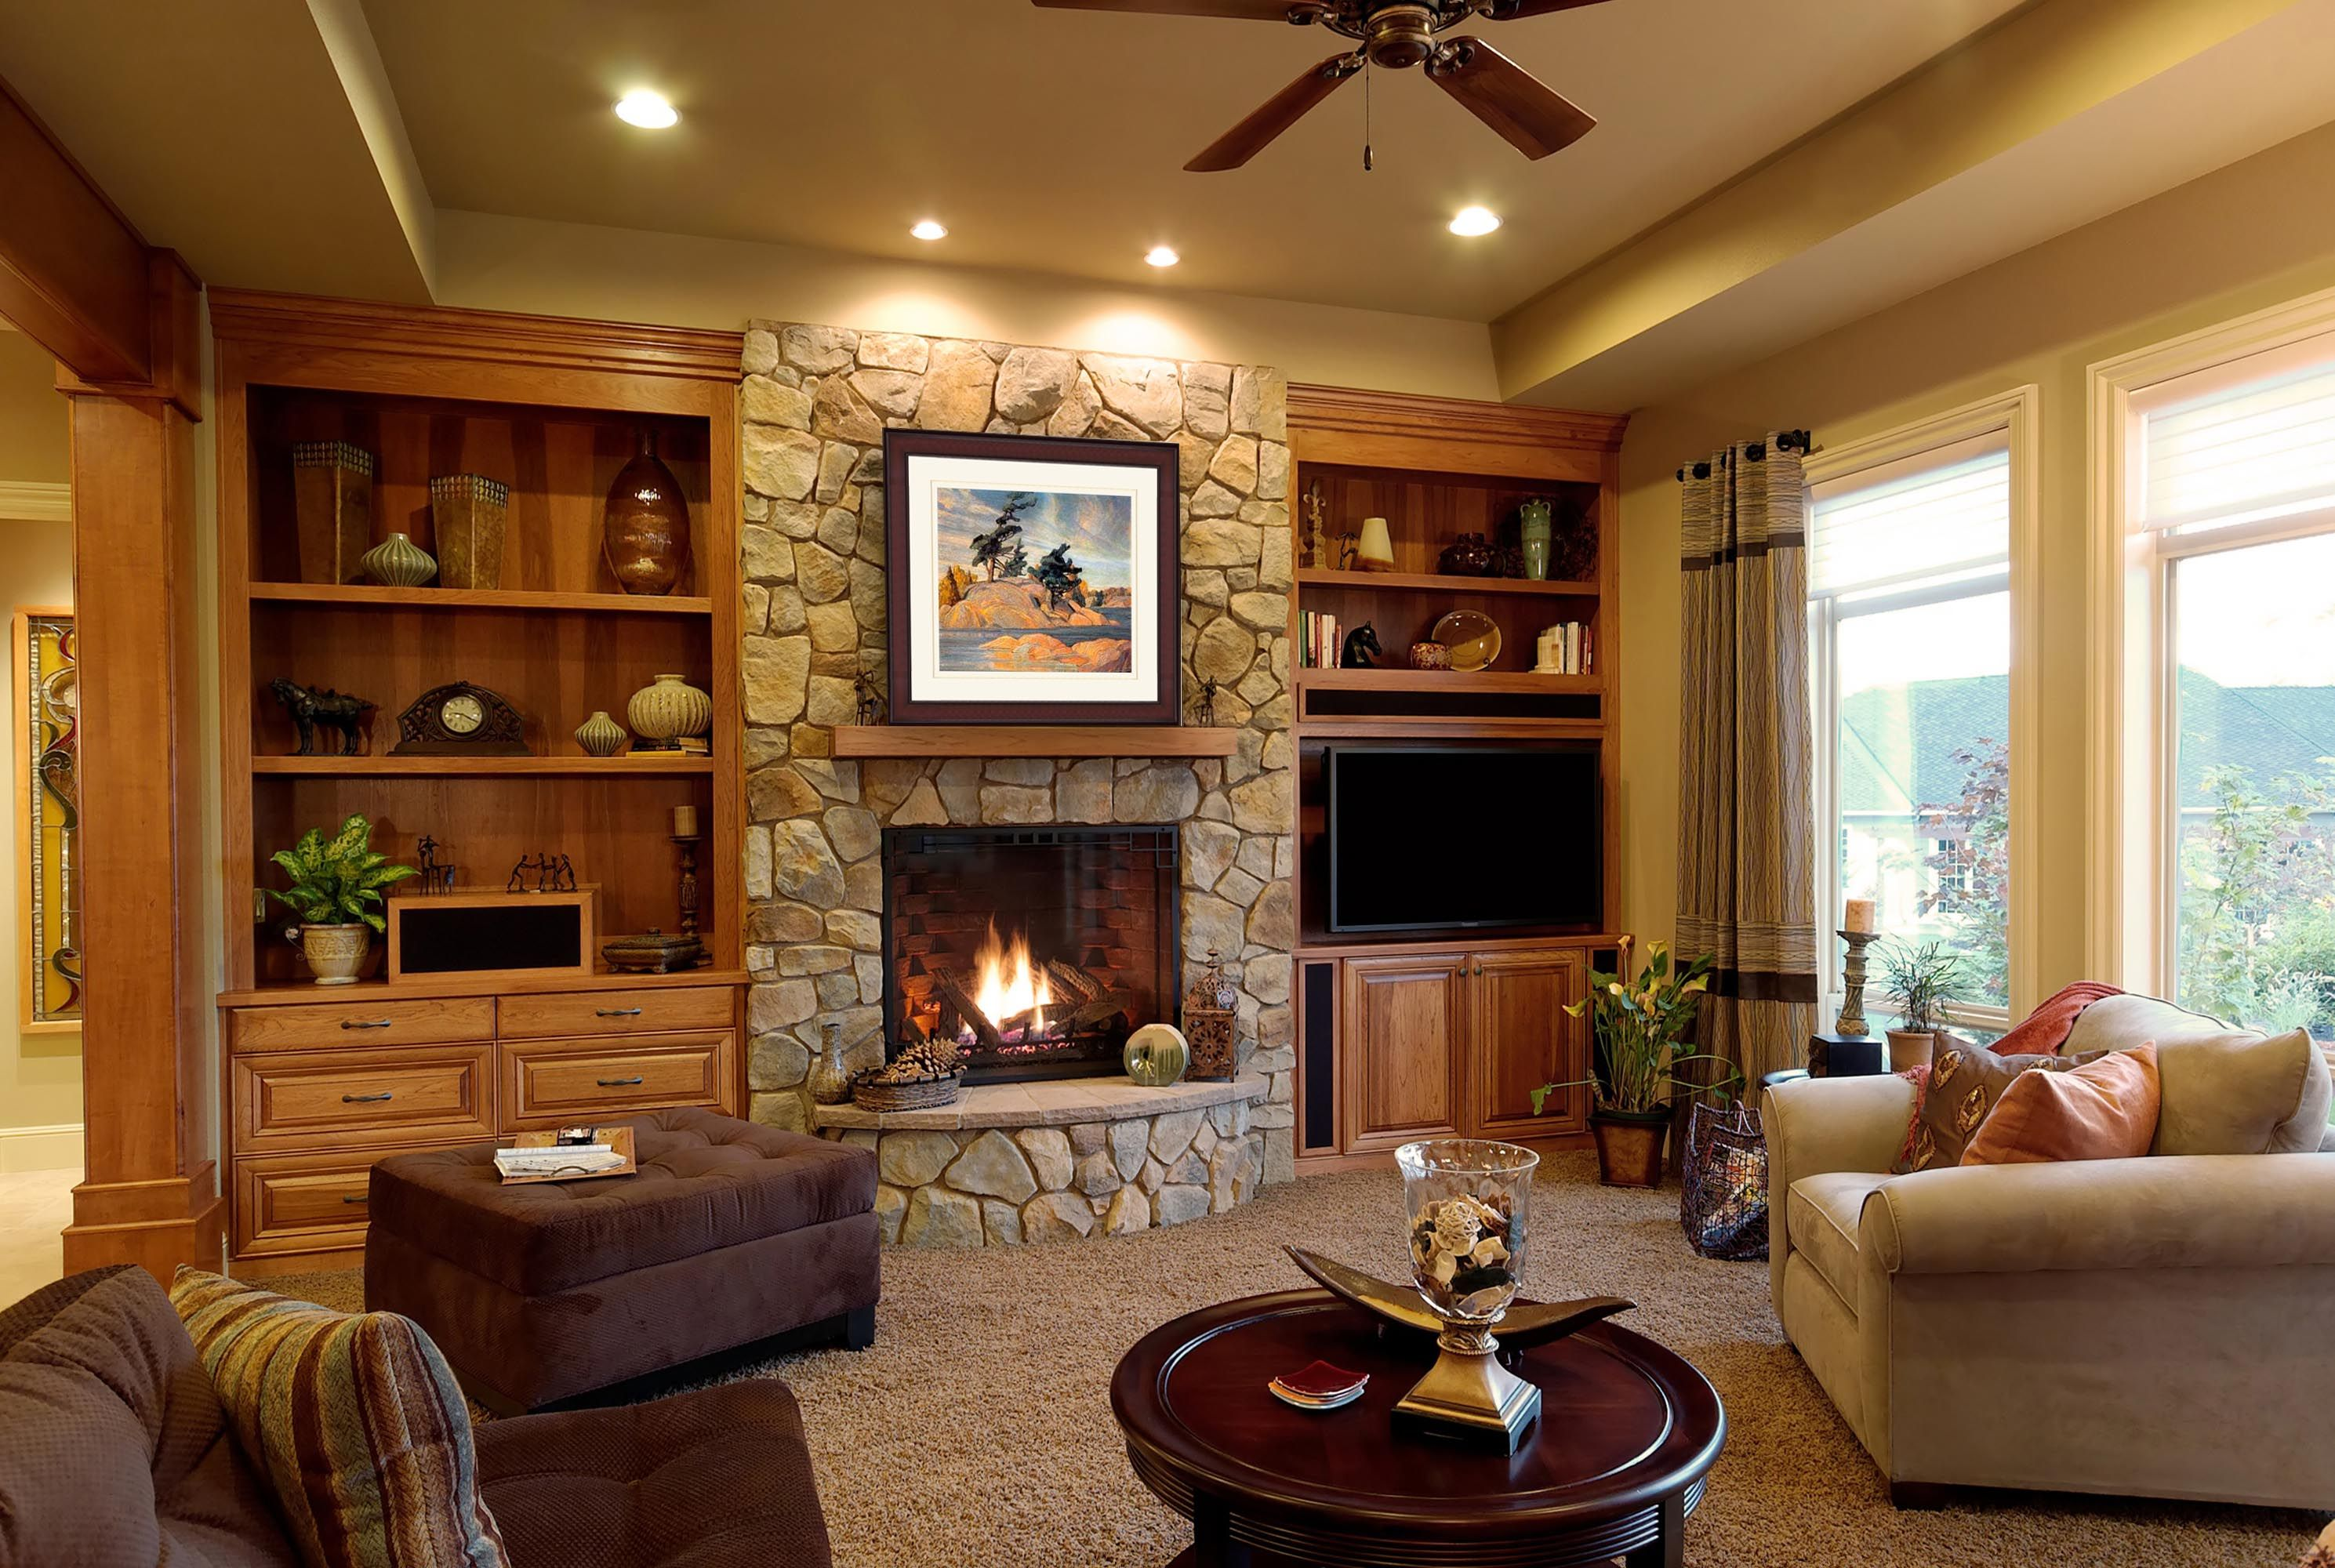 Best Pin By Vanya Trifonova On Home Sweet Home Living Room Warm Cozy Living Room Design Cozy 400 x 300